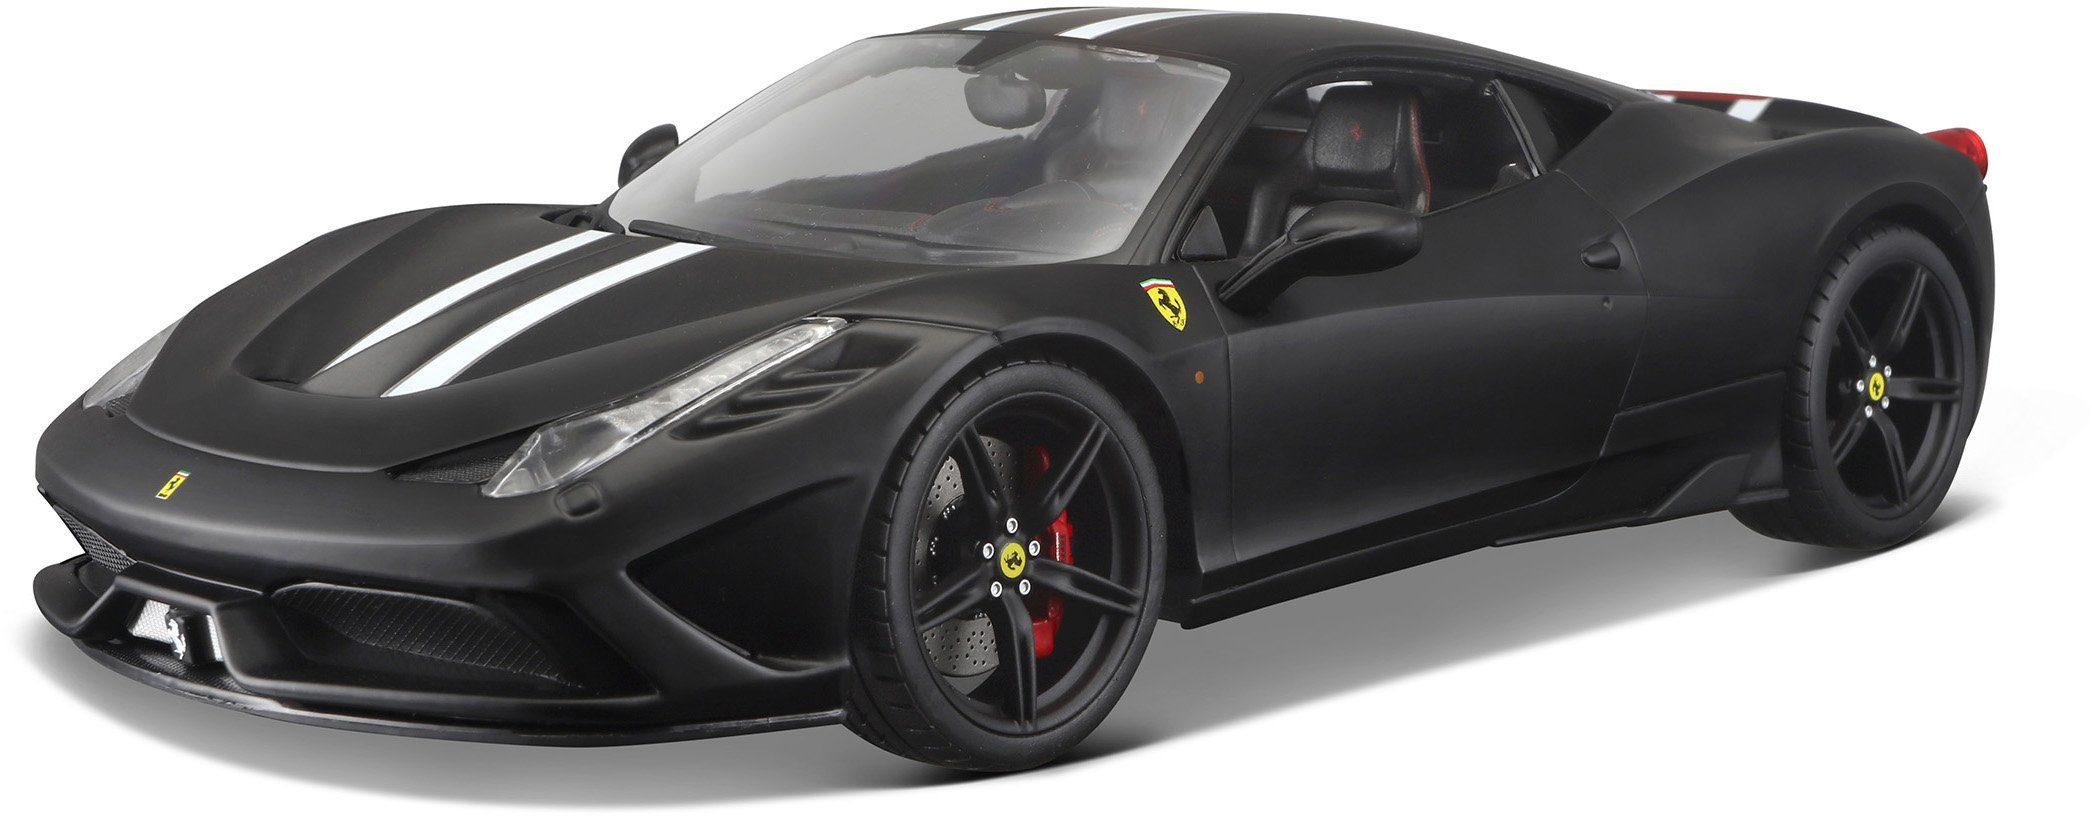 Bburago® Modellauto im Maßstab 1:18, »Ferrari 458 Speciale, schwarz«